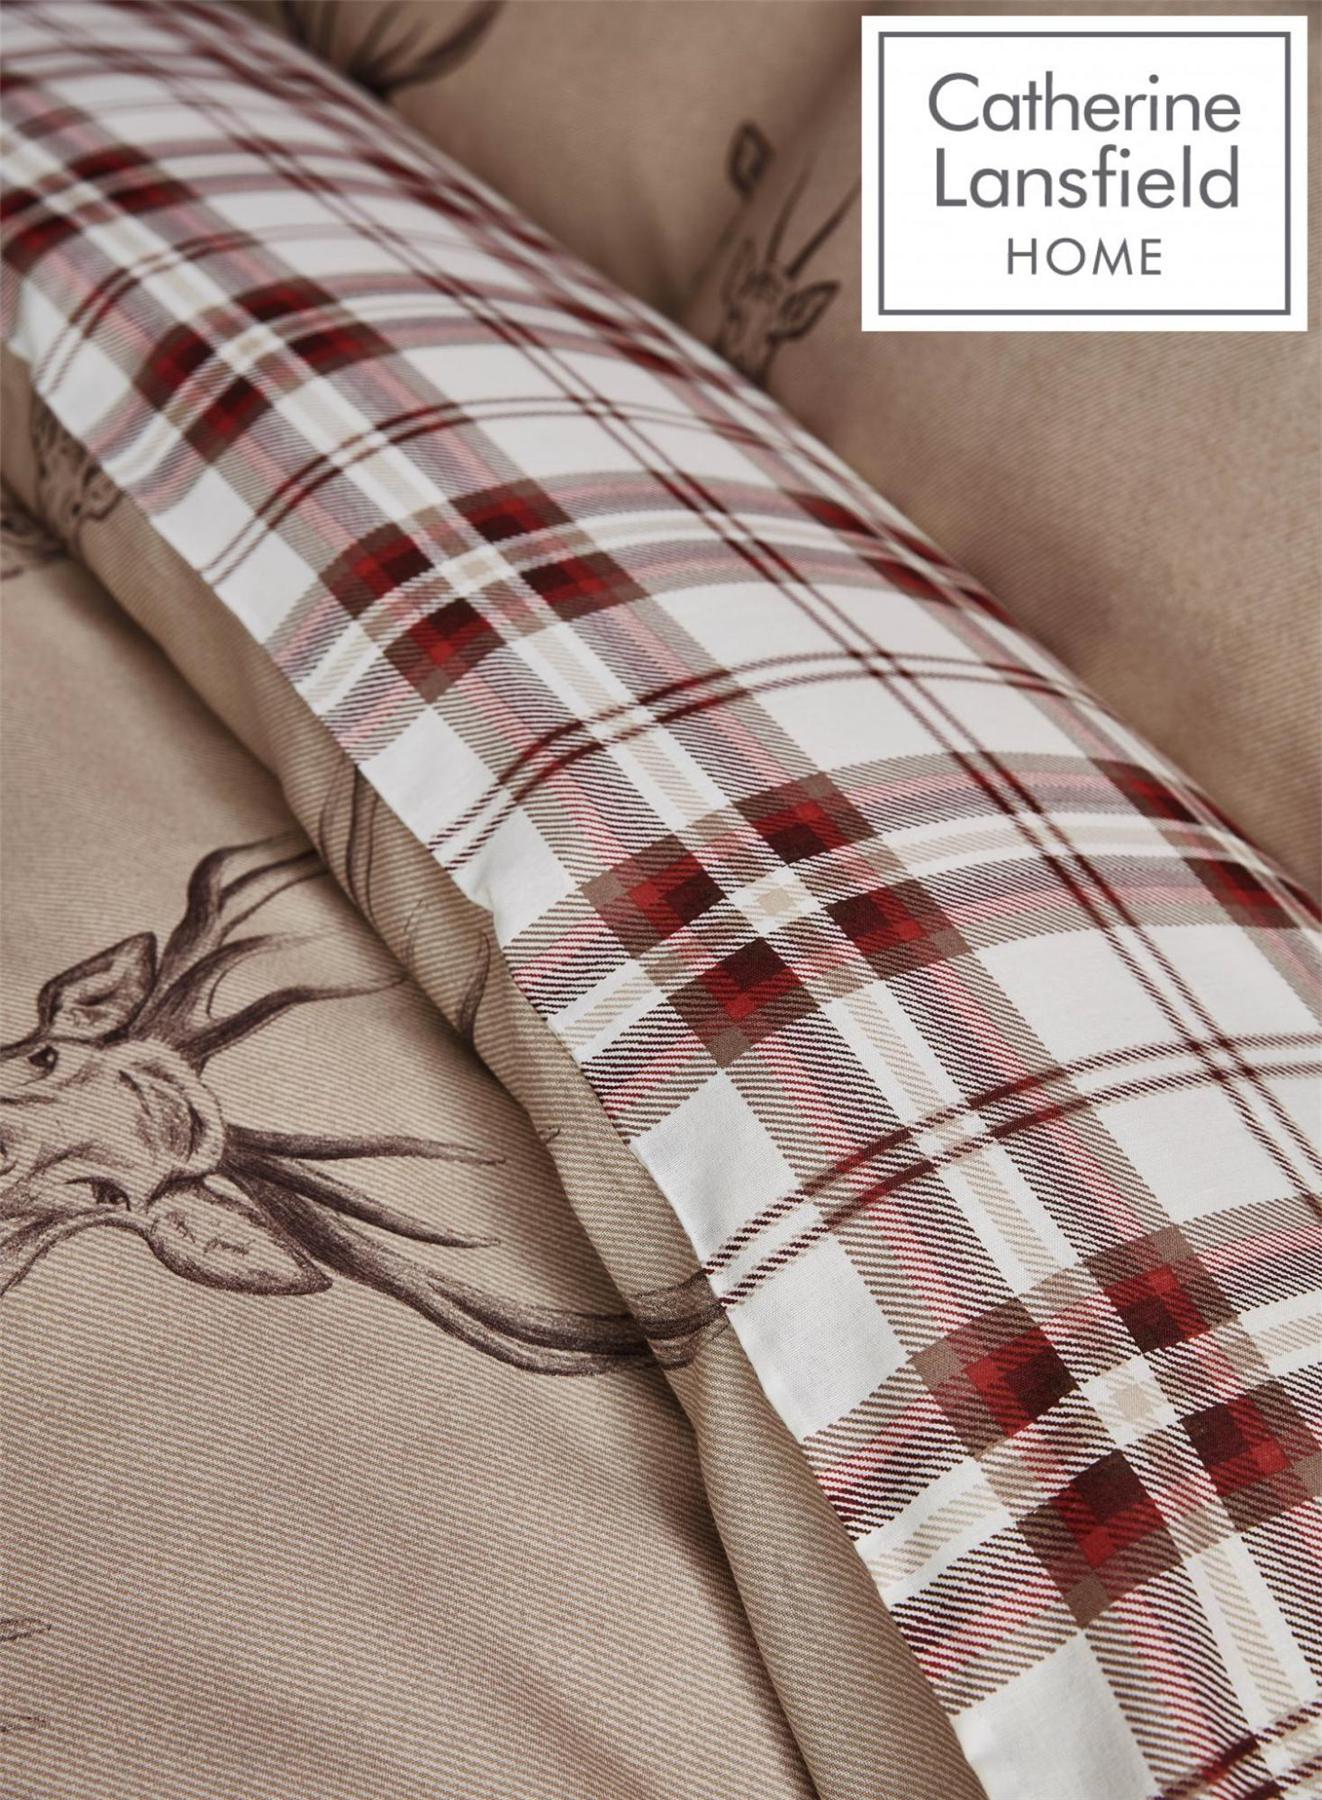 Catherine-Lansfield-Duvet-Set-Highland-Stag-Reversible-Check-Bedding-Mushroom thumbnail 8